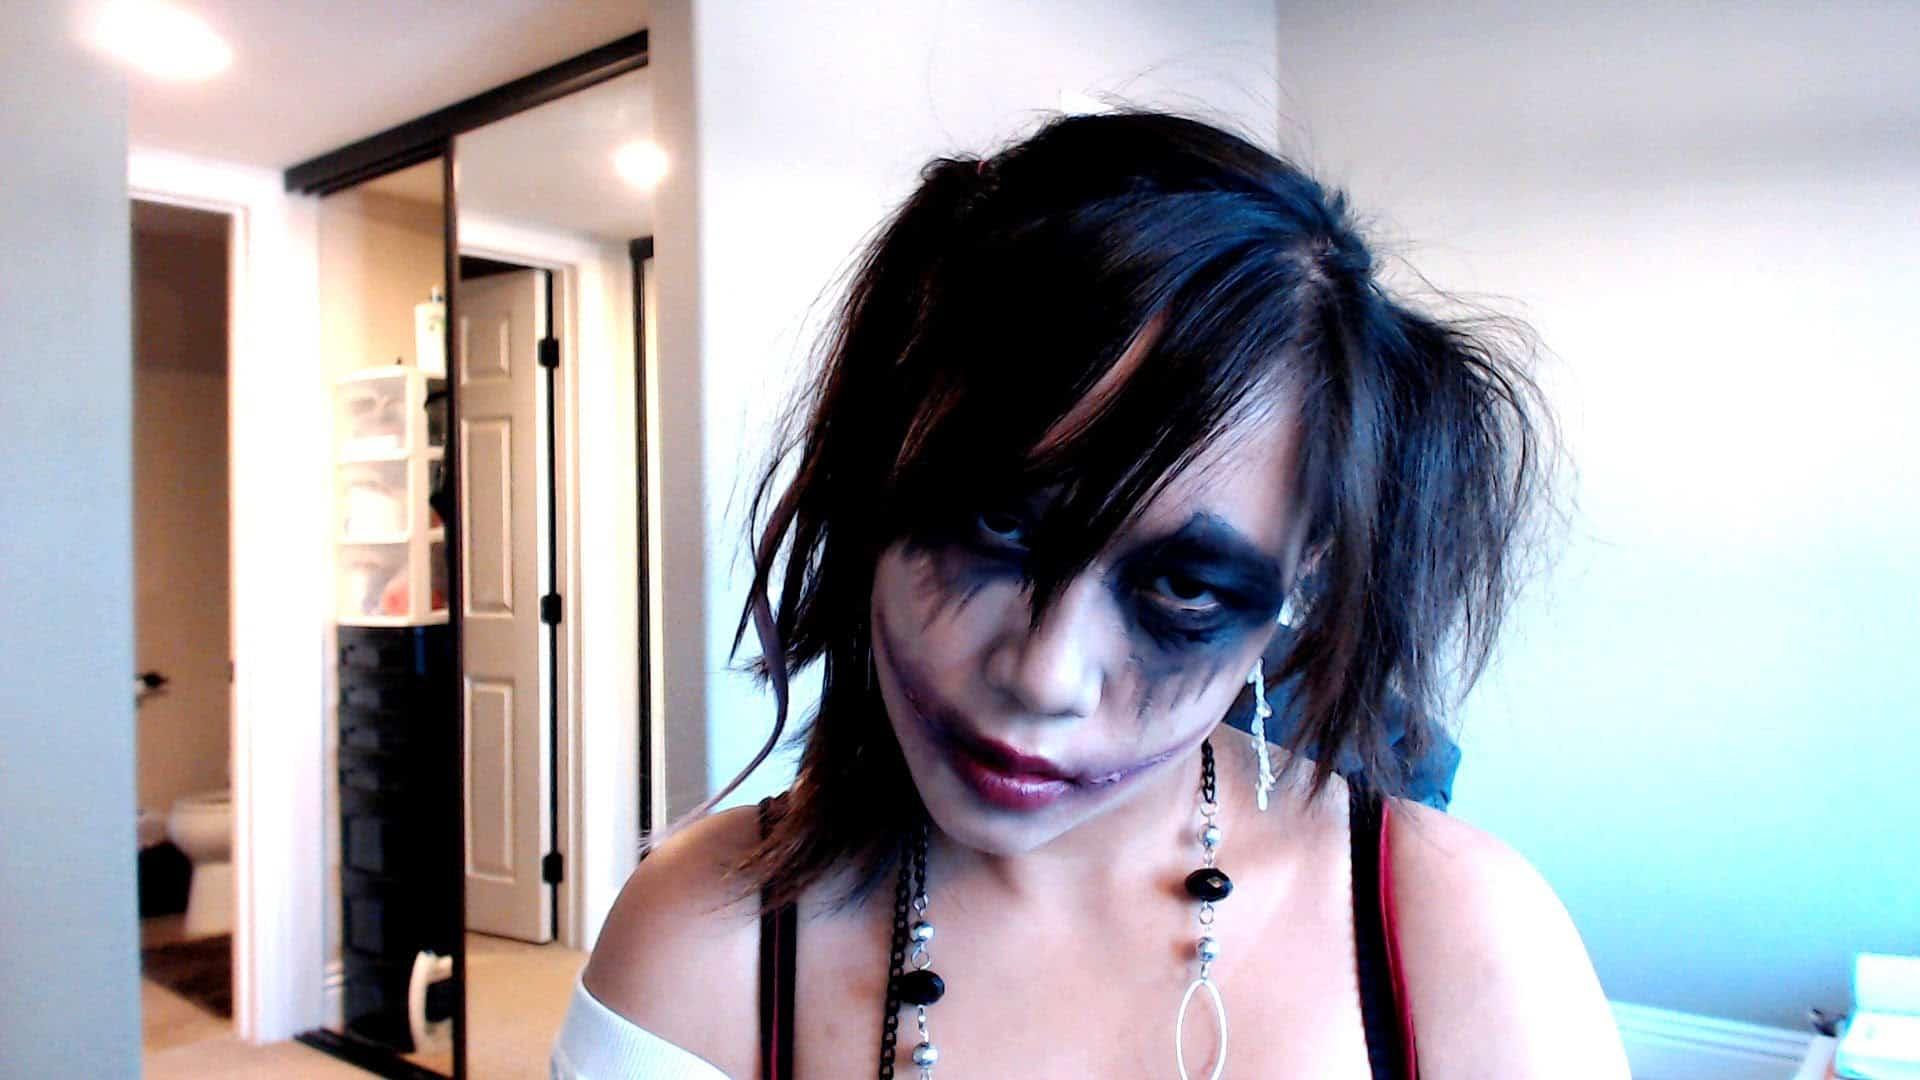 Joker inspired makeup